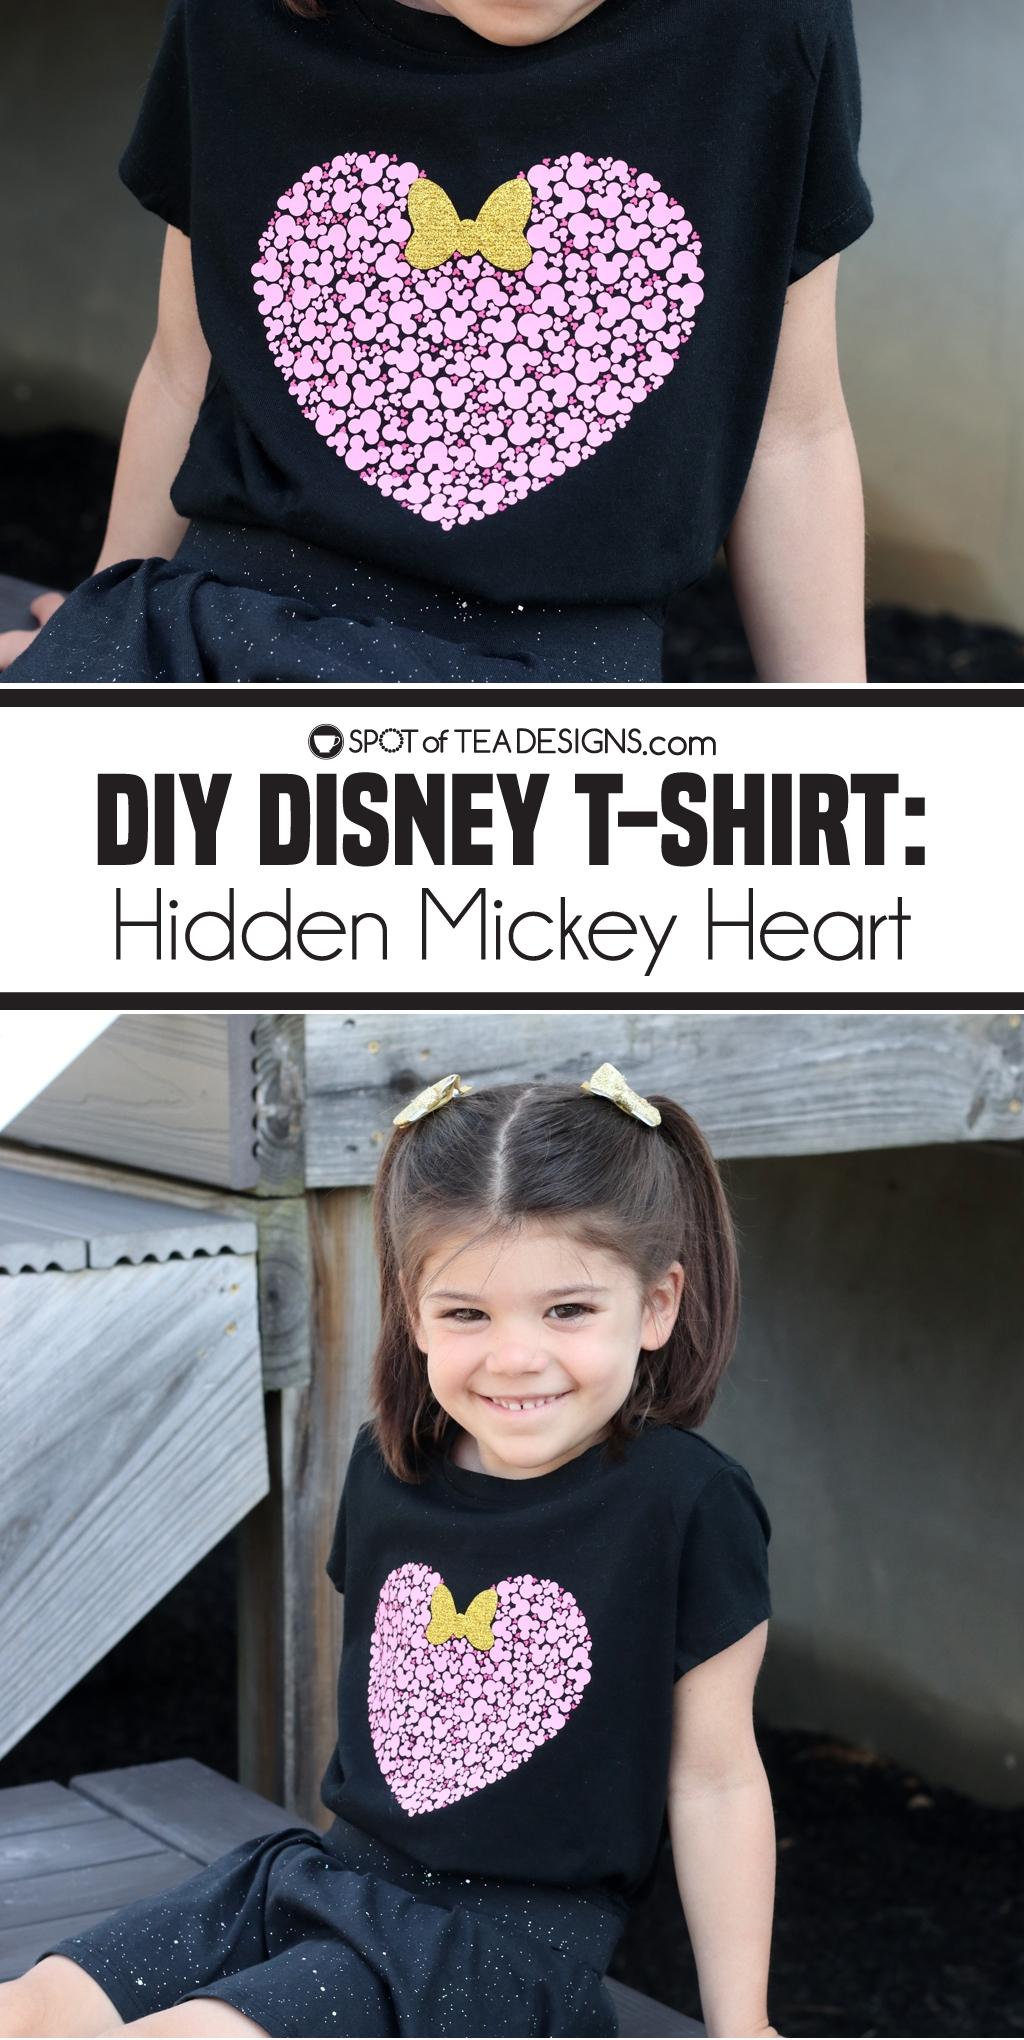 DIY Disney T-shirt - Hidden Mickey Heart   spotofteadesigns.com